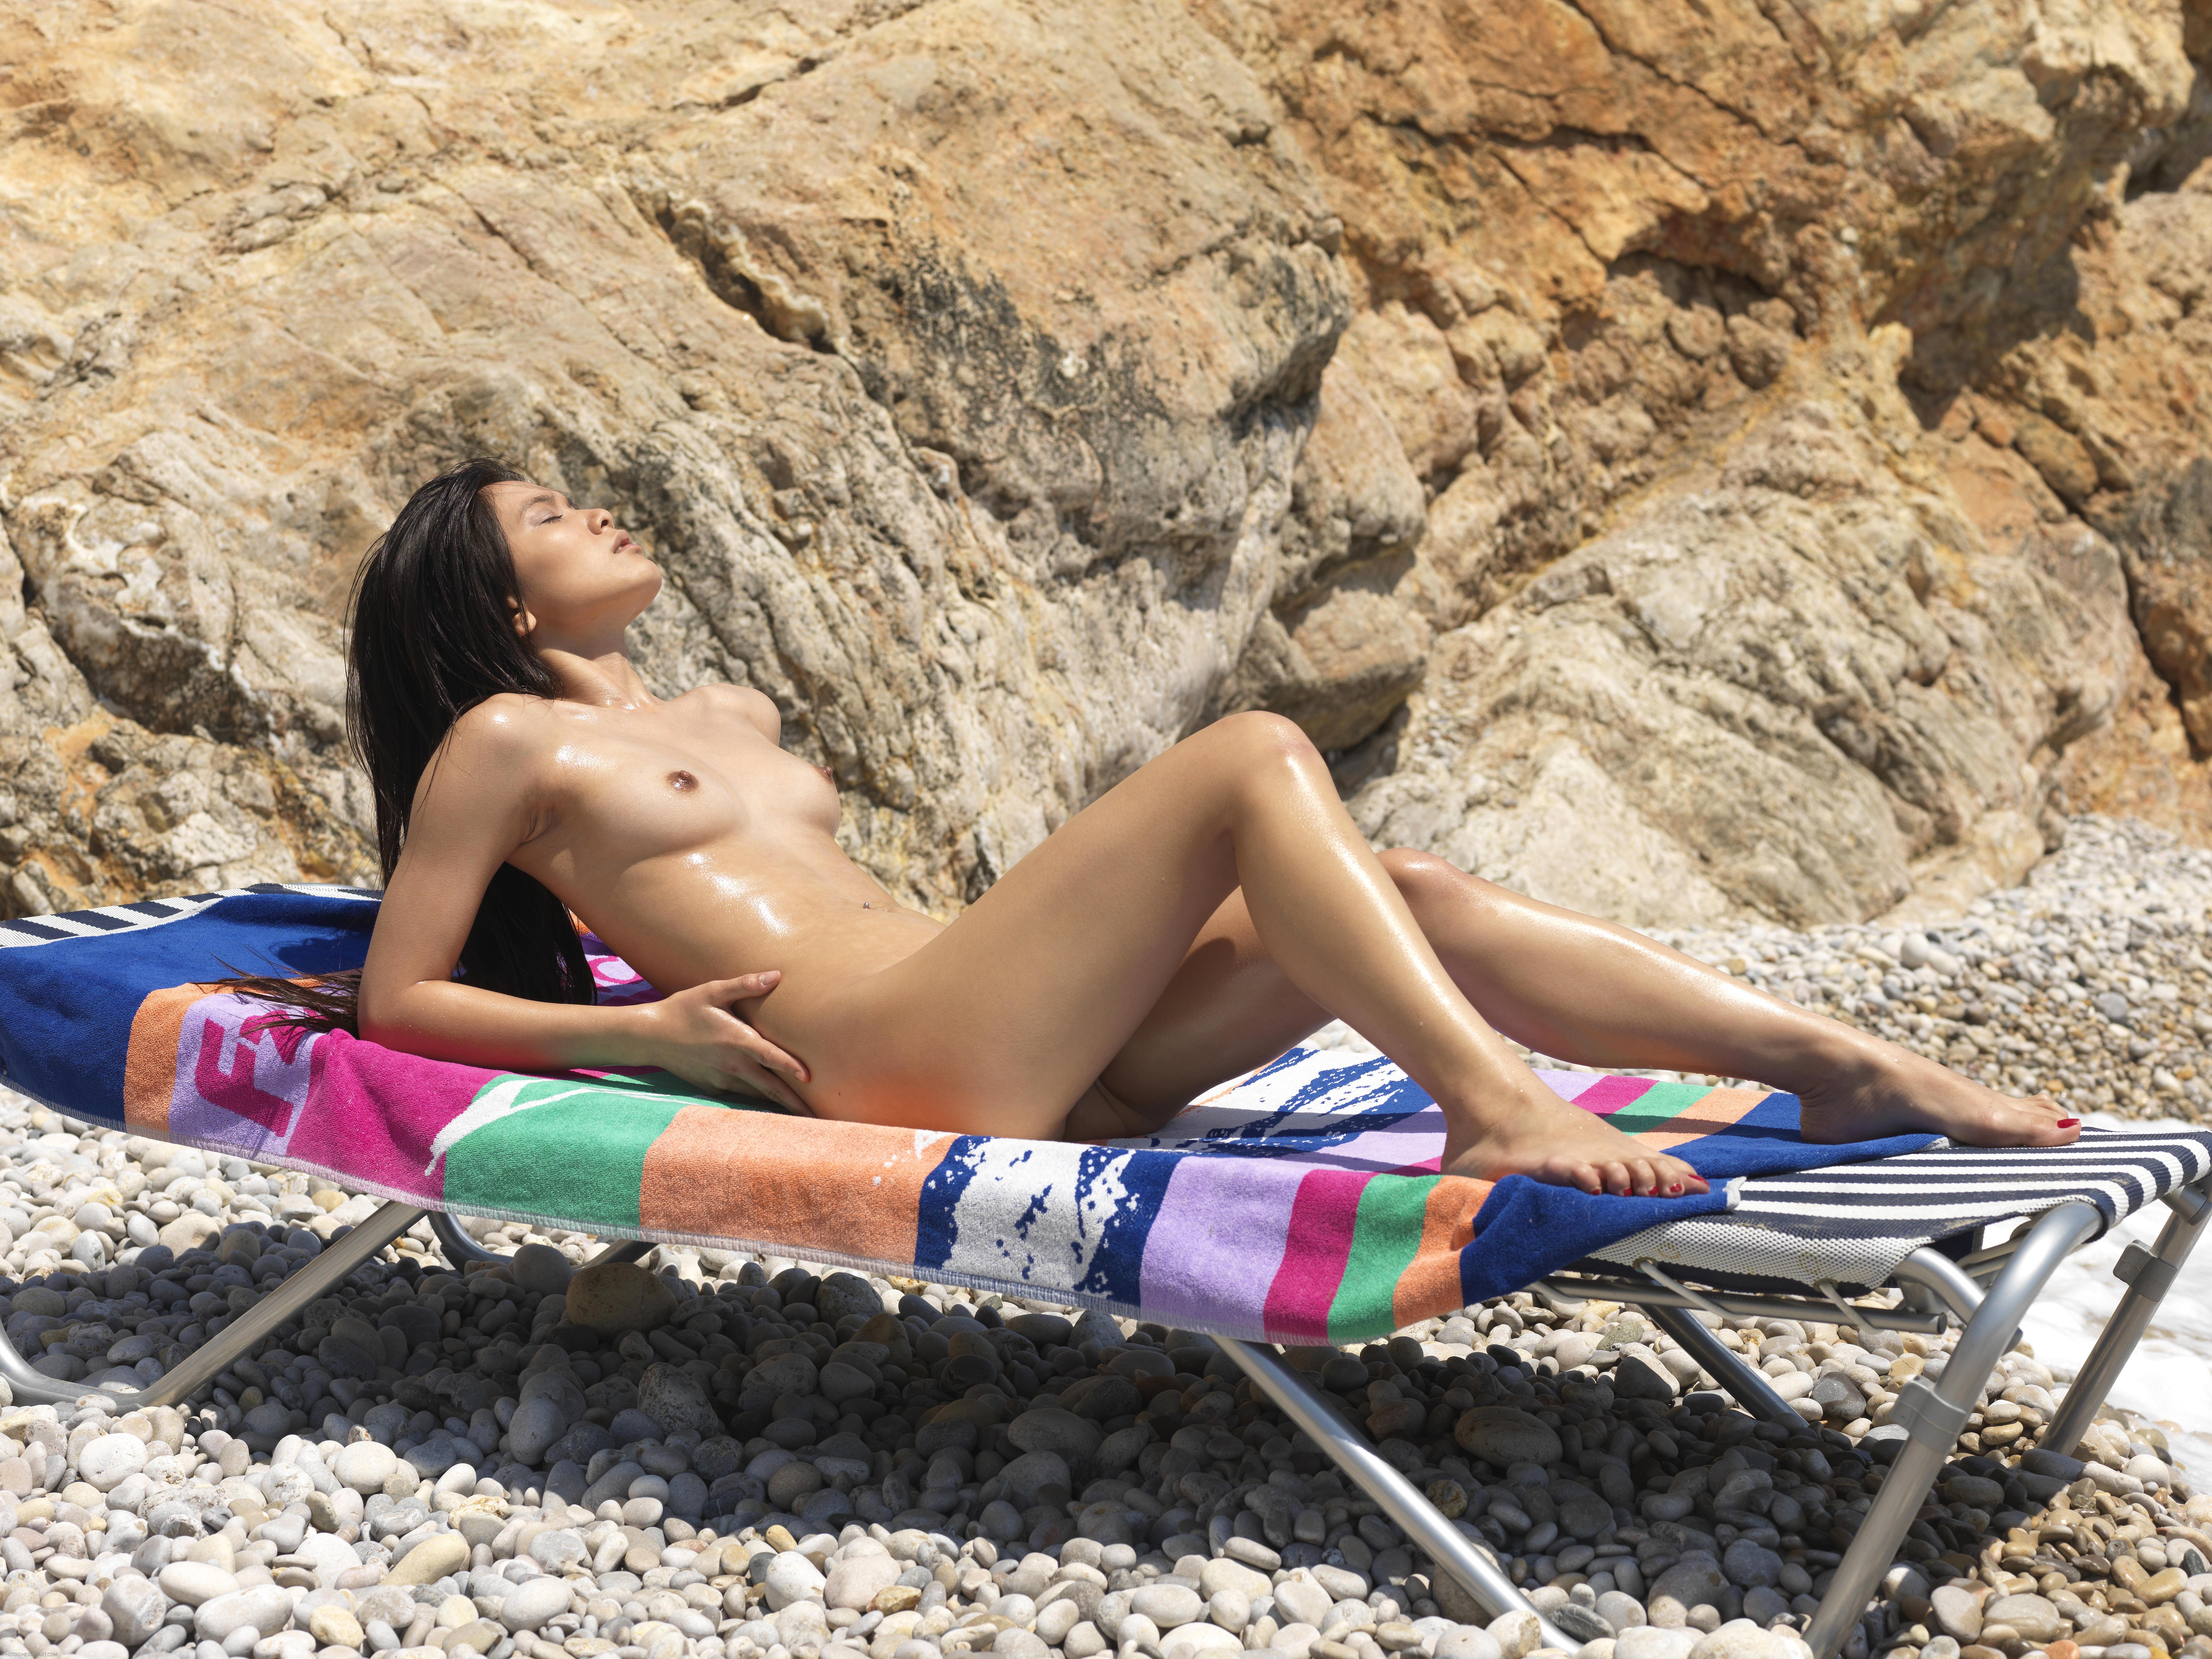 Yoko Nude Beach 2010 11 25 015 xxxxl. Free GAMES | FileSonic Search ...